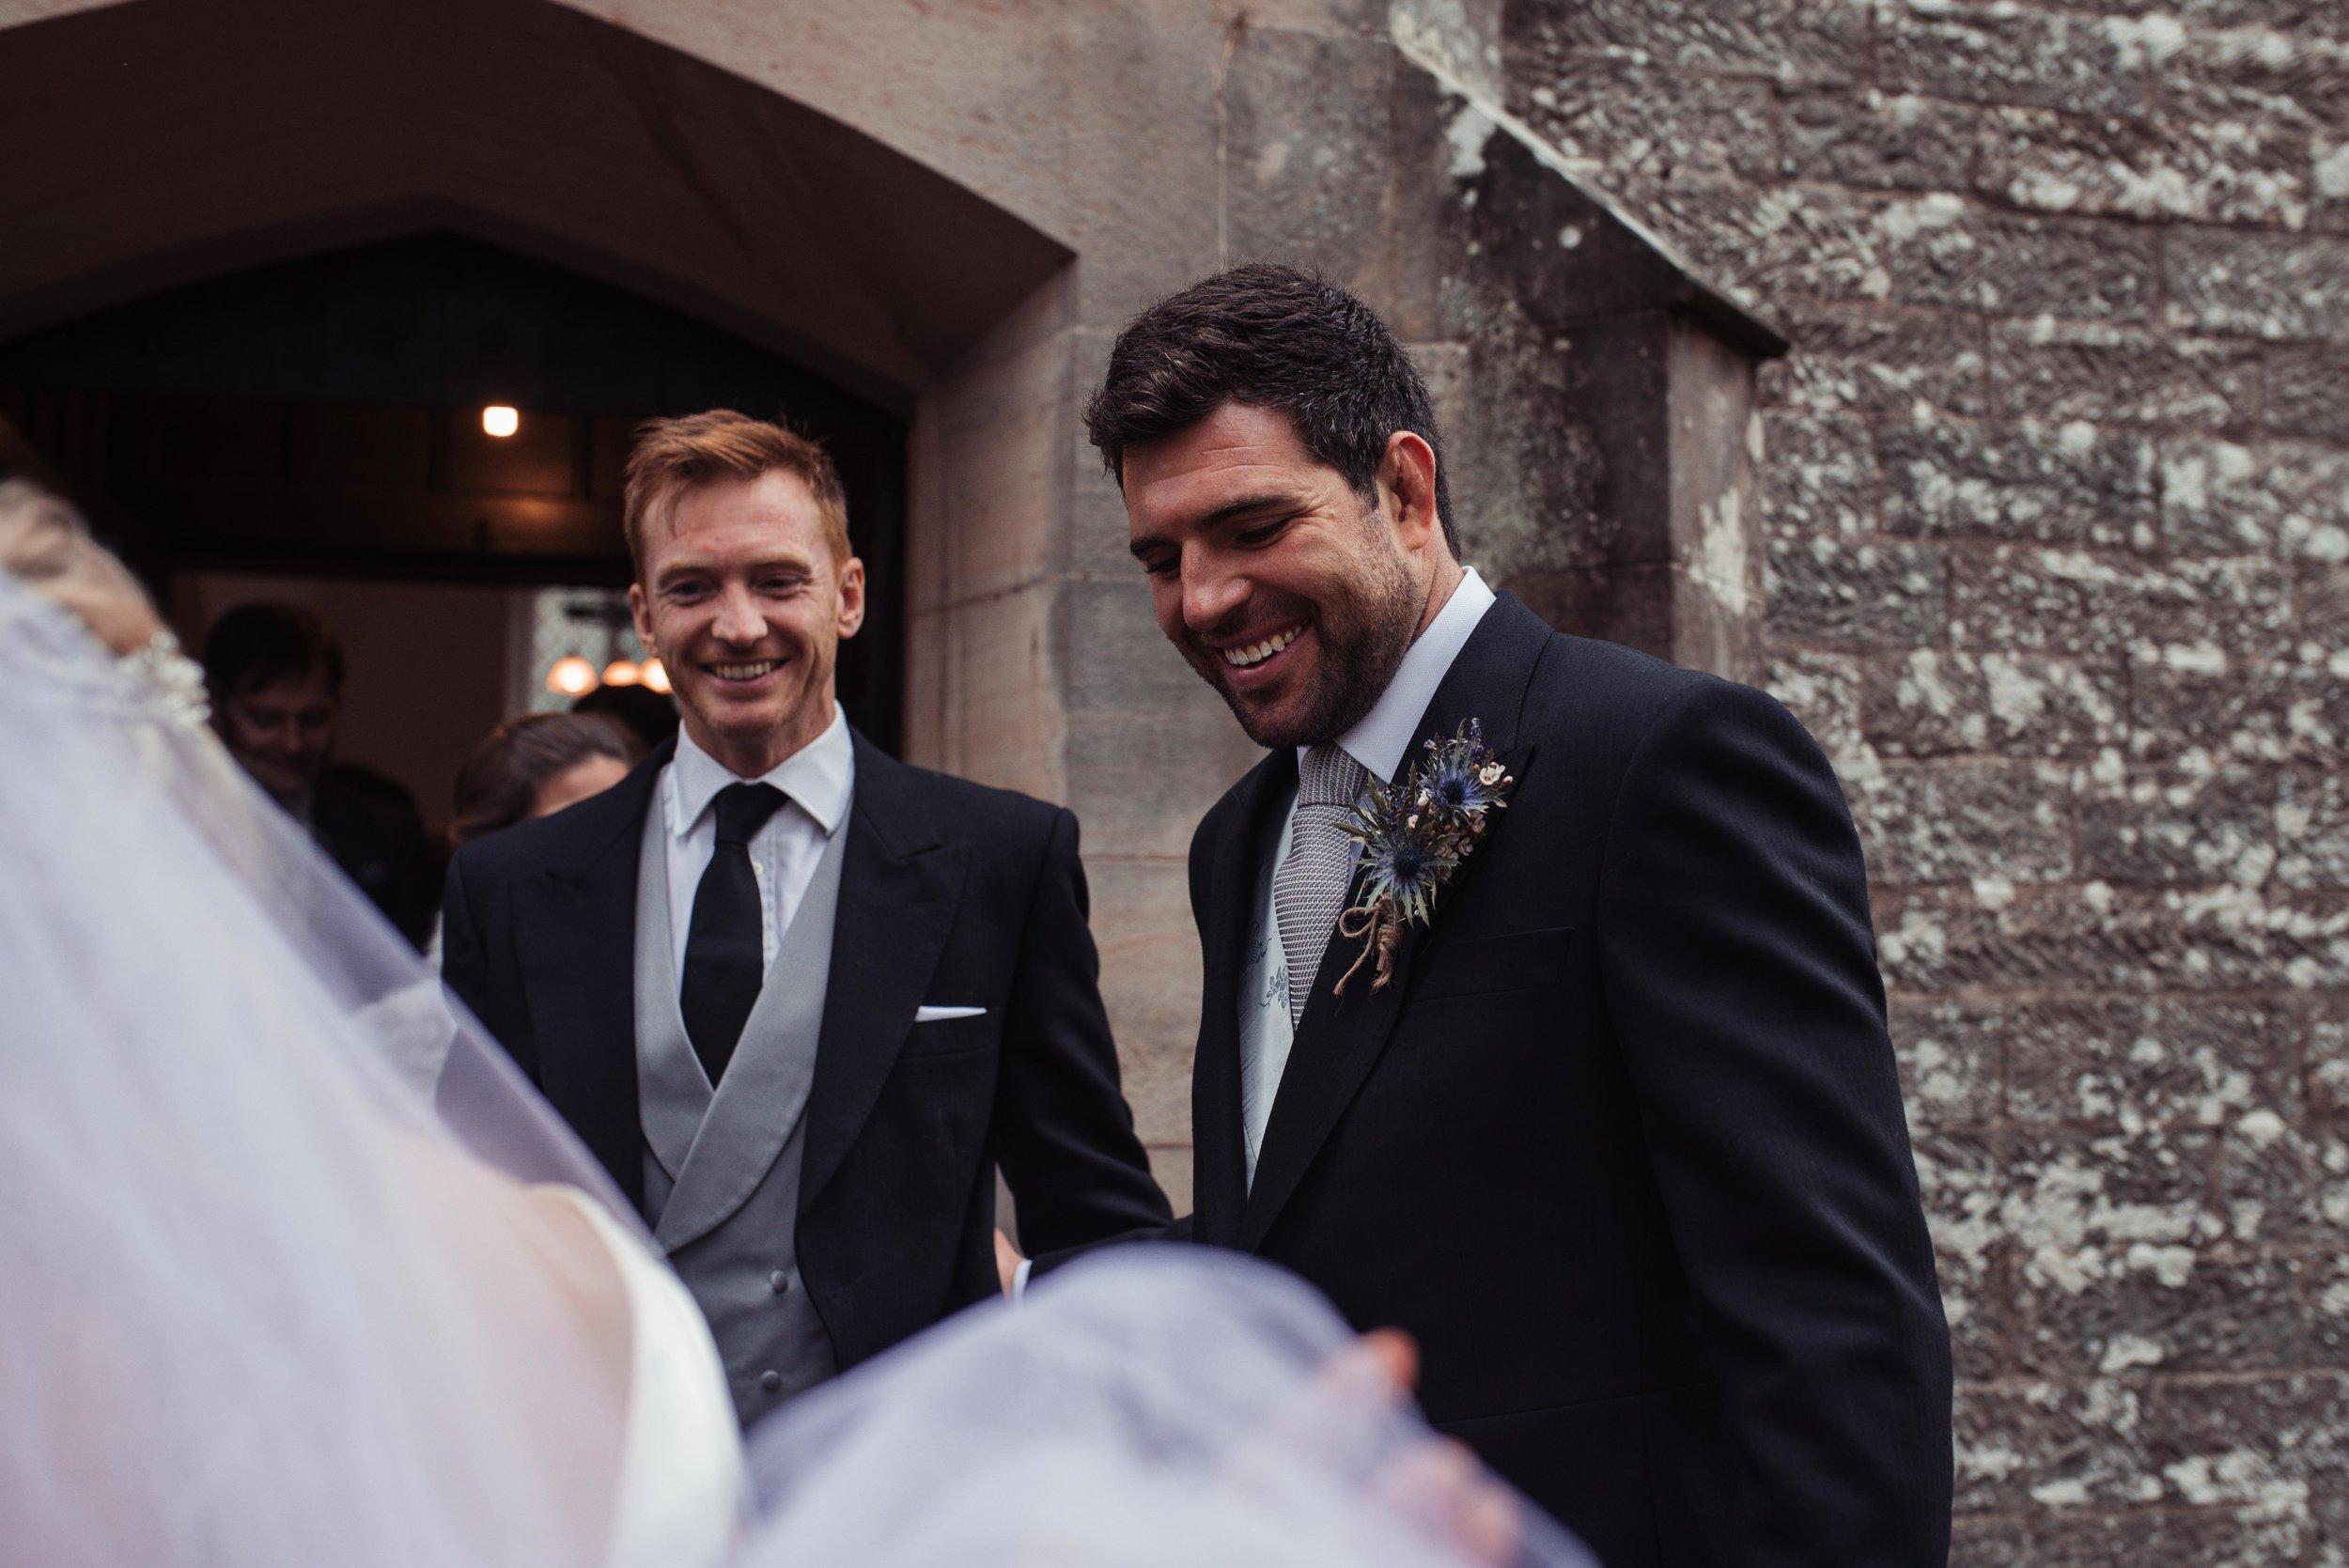 Askham-Hall-Wedding-Photography-39.jpg